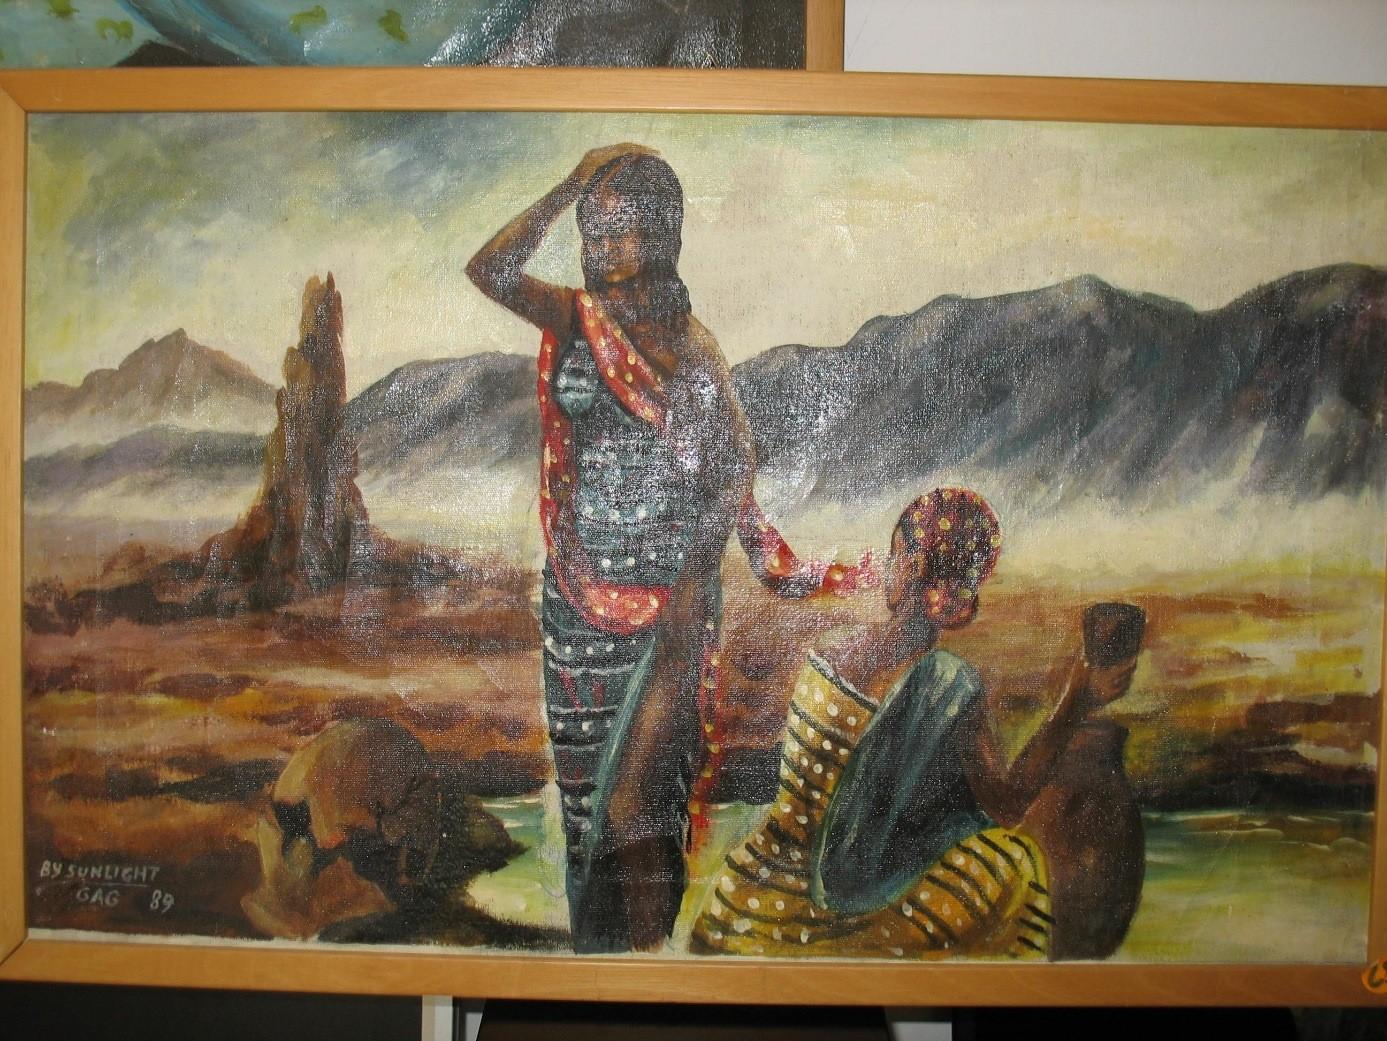 Biyo Nolol (Water is life) 1989